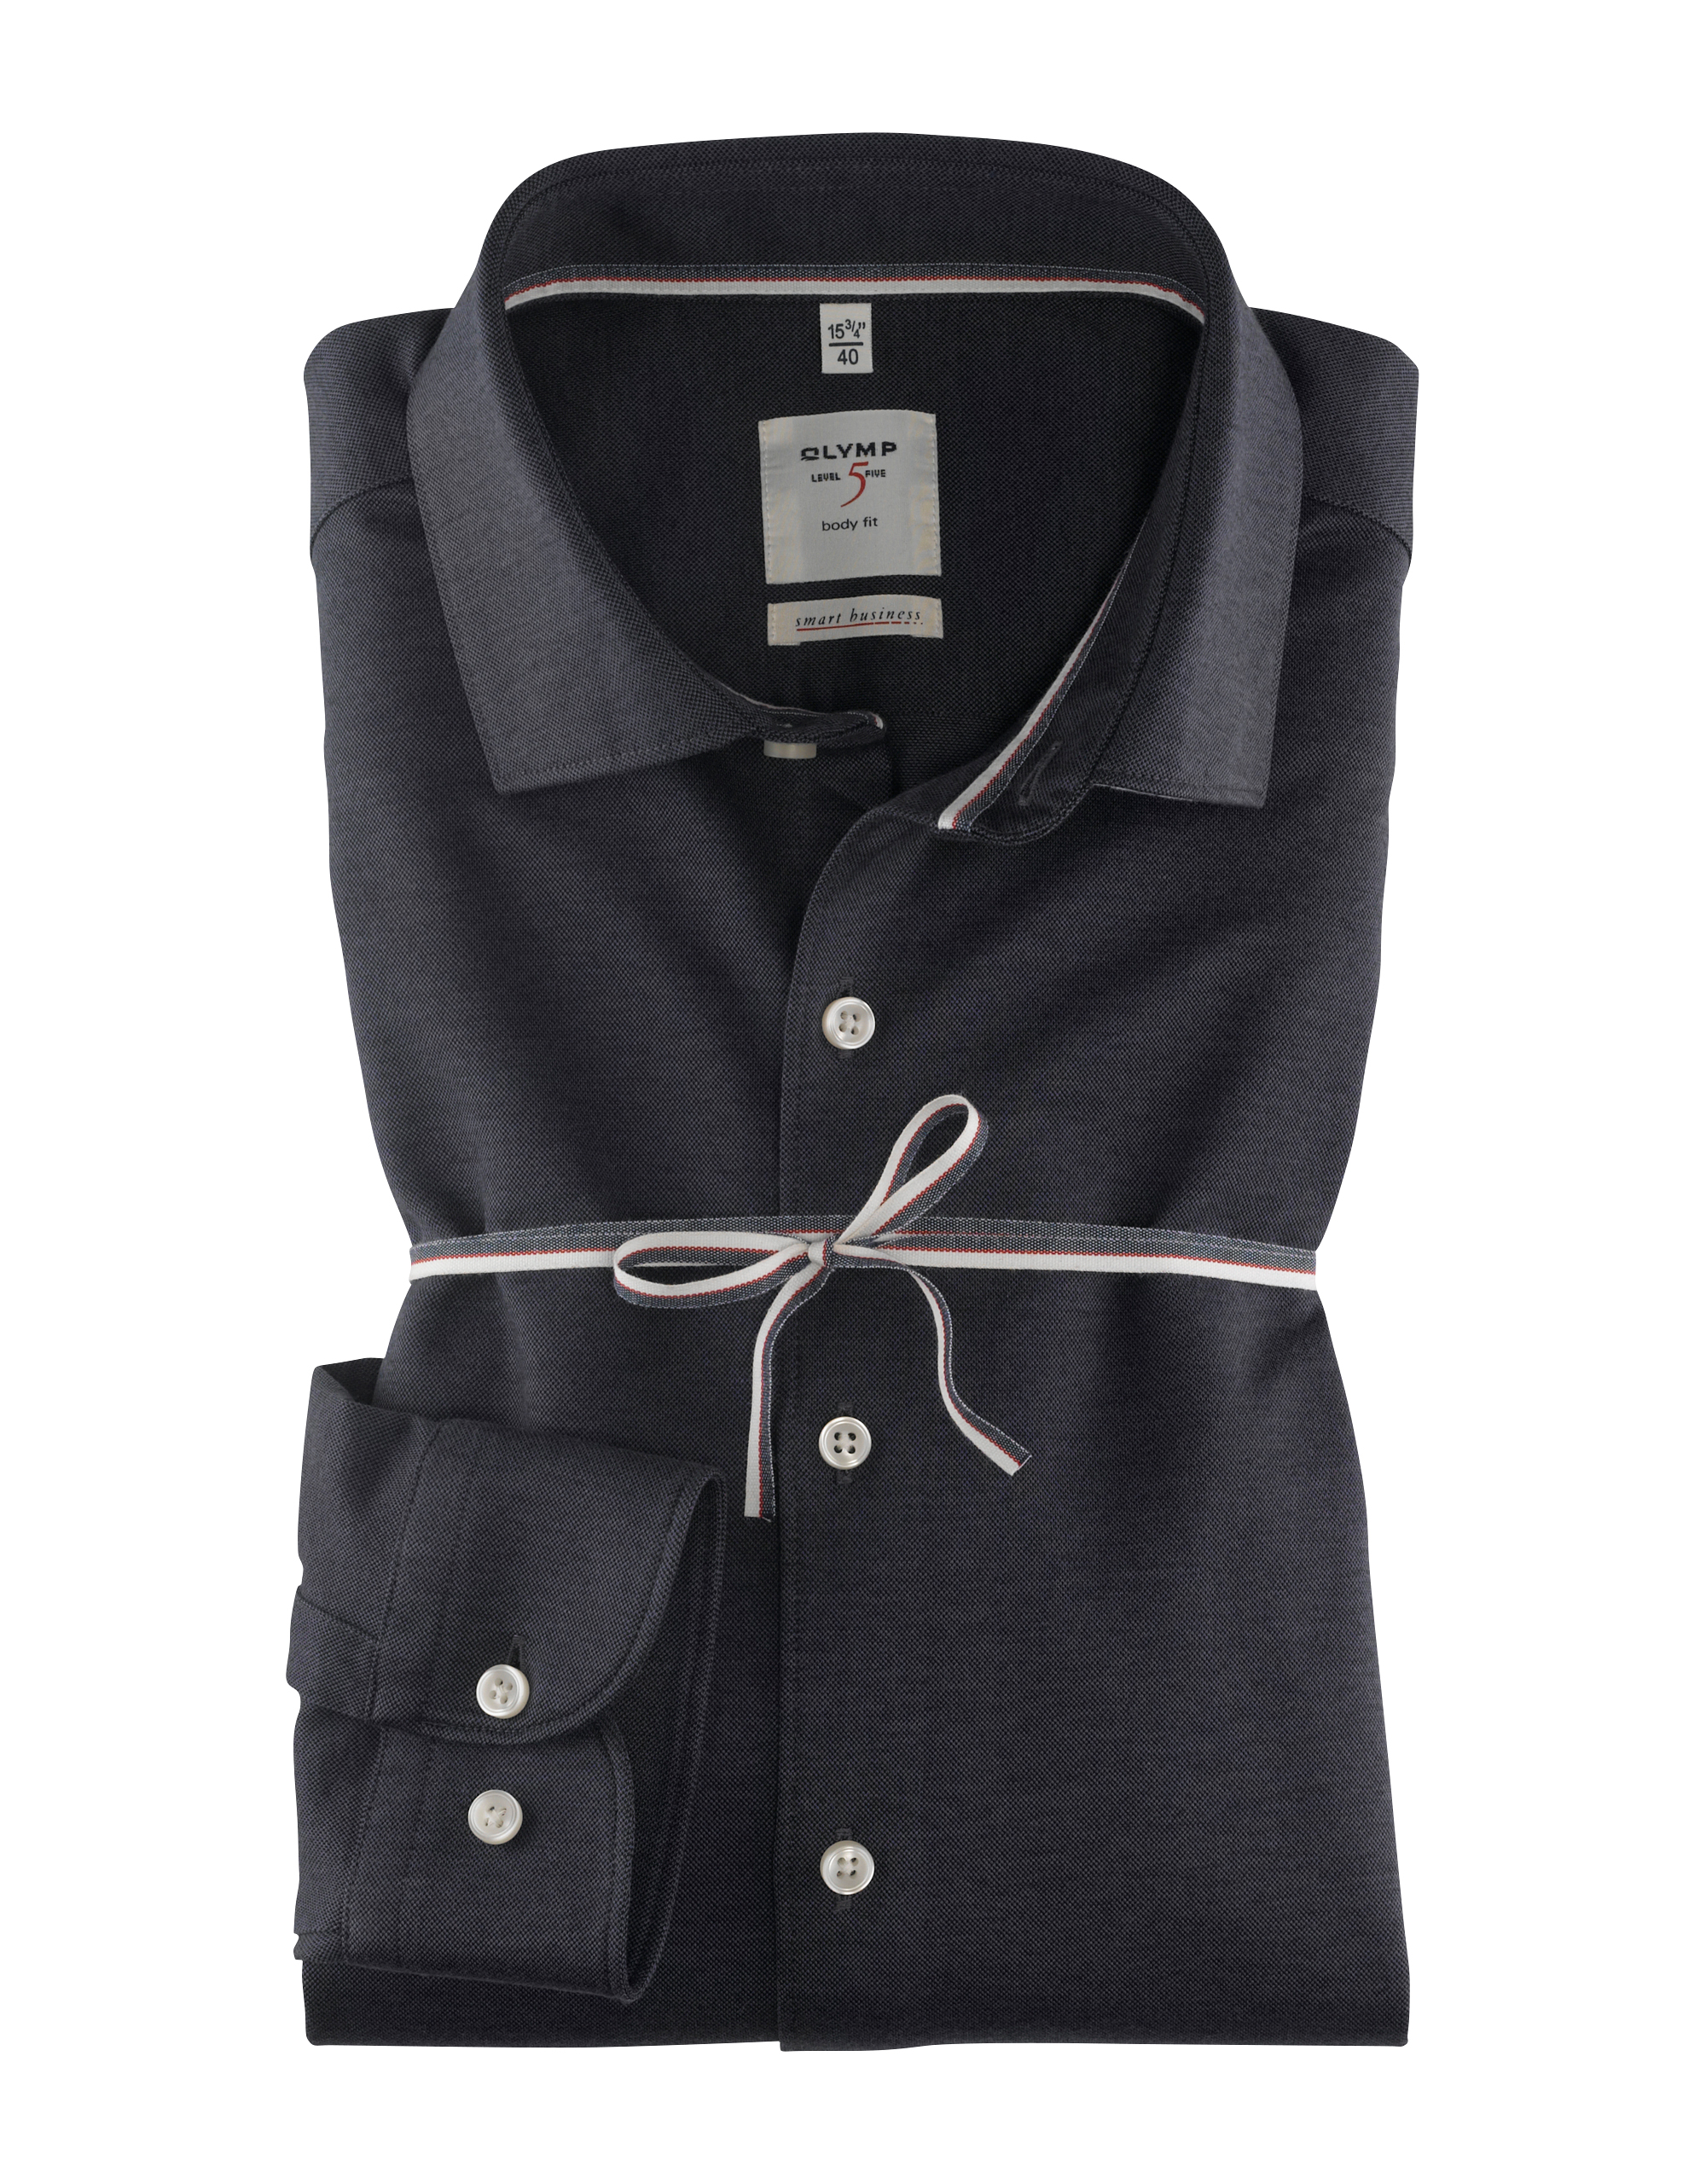 OLYMP Level Five Smart Business Hemd, body fit, Kent, Schwarz, 39   Bekleidung > Hemden > Business Hemden   Schwarz   Baumwolle   OLYMP